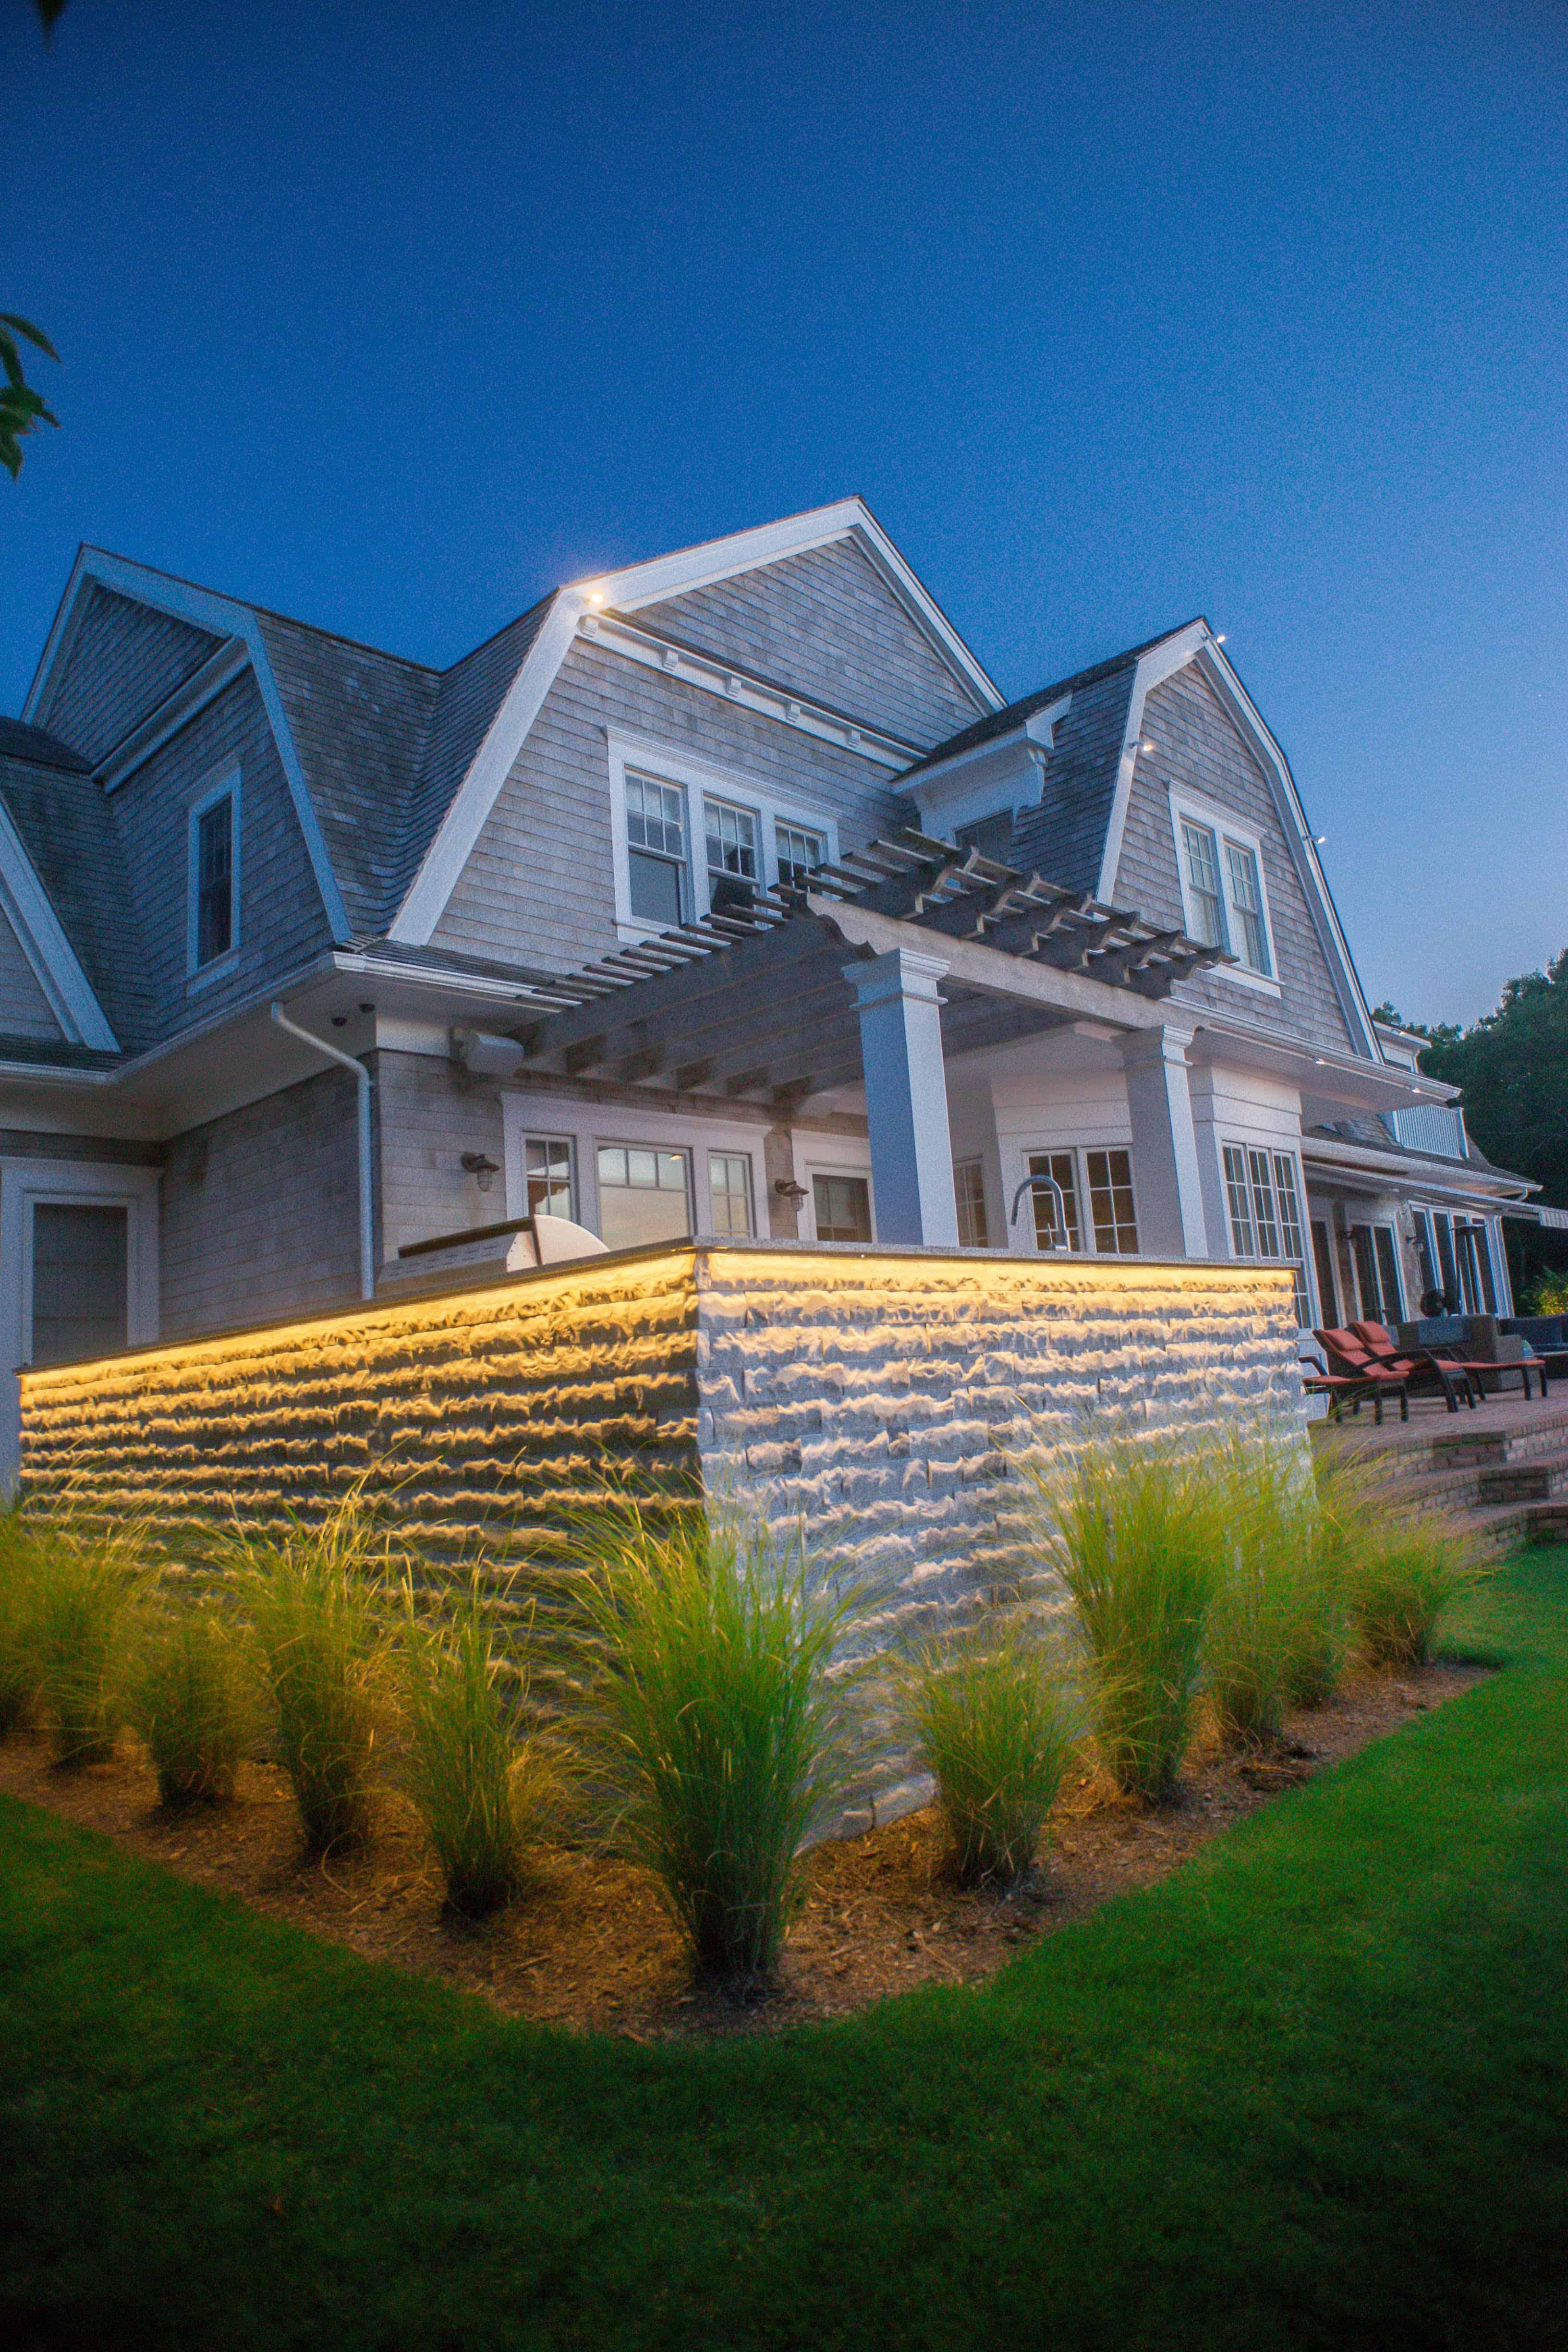 Outdoor Kitchen with LED Lighting and Marmiro Stone Veneer - Deep Blue - Southampton, Long Island NY